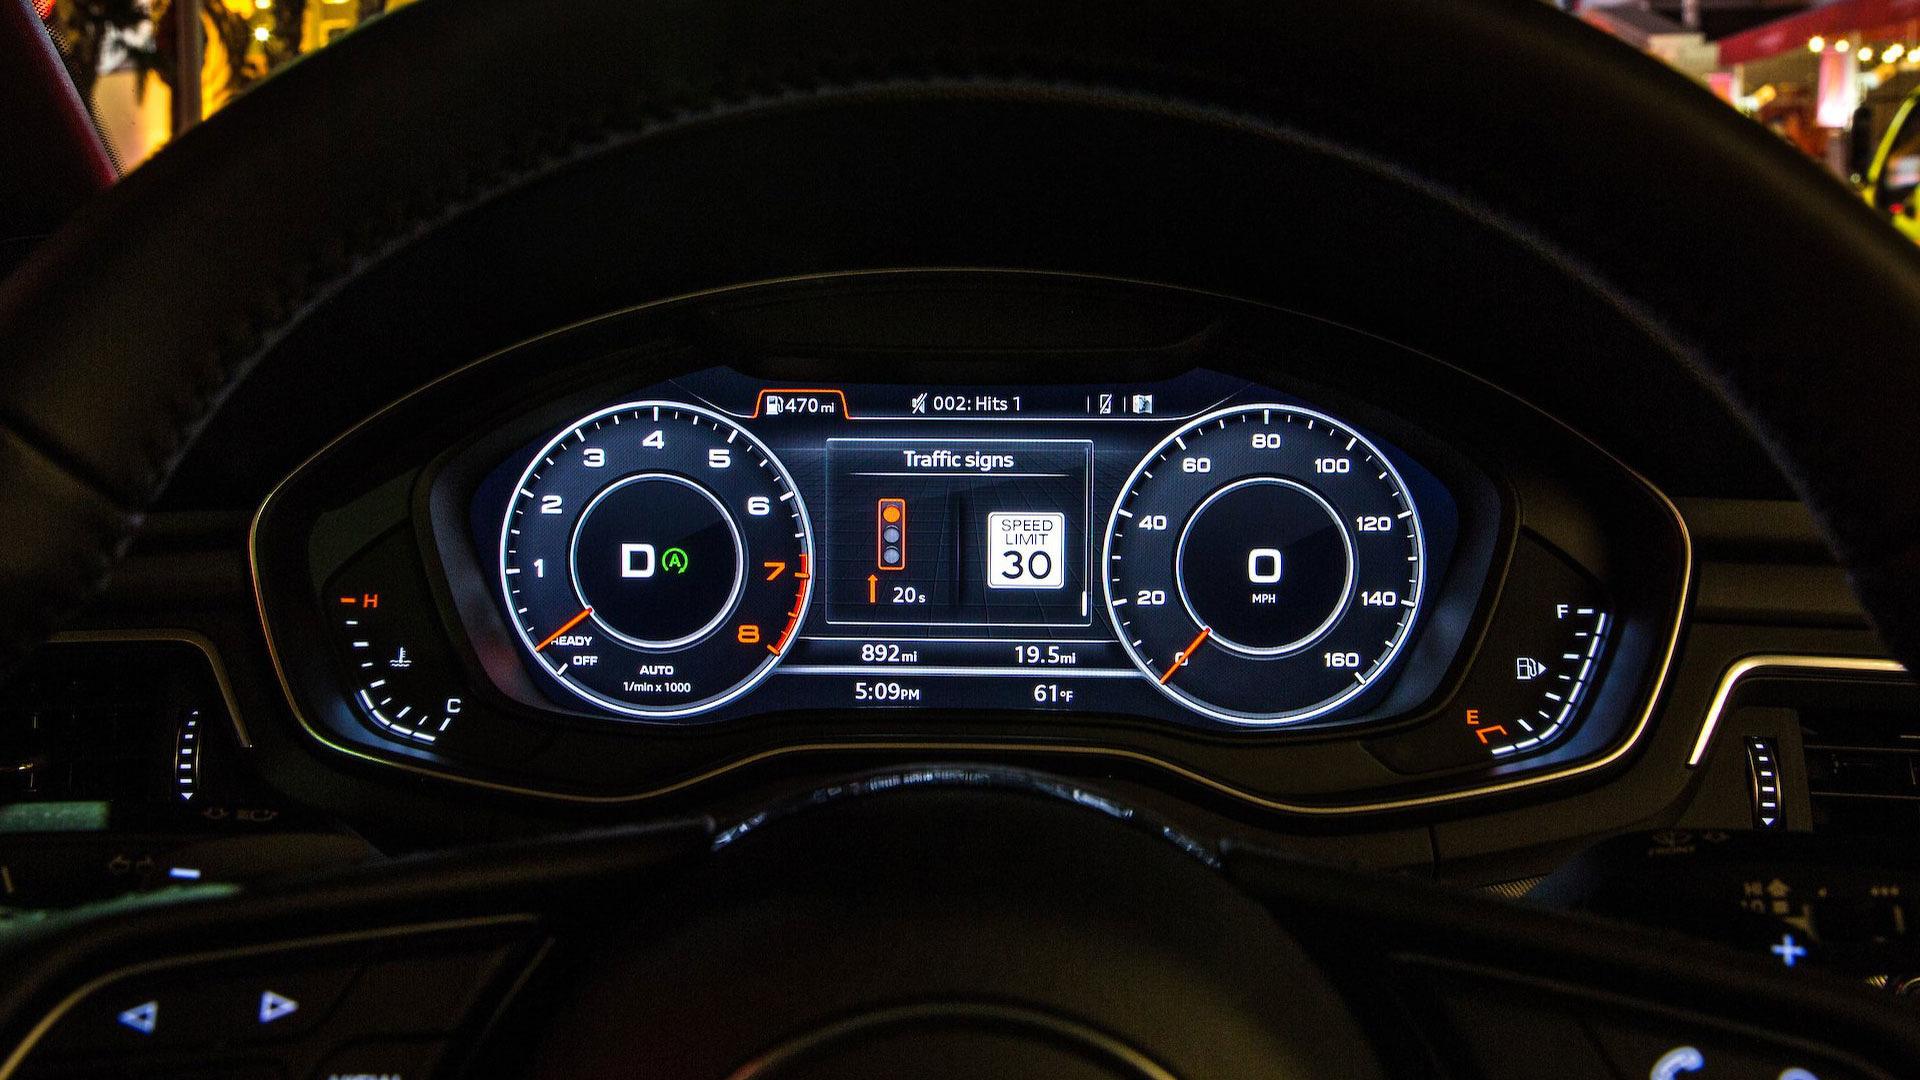 audi-traffic-light-information-display